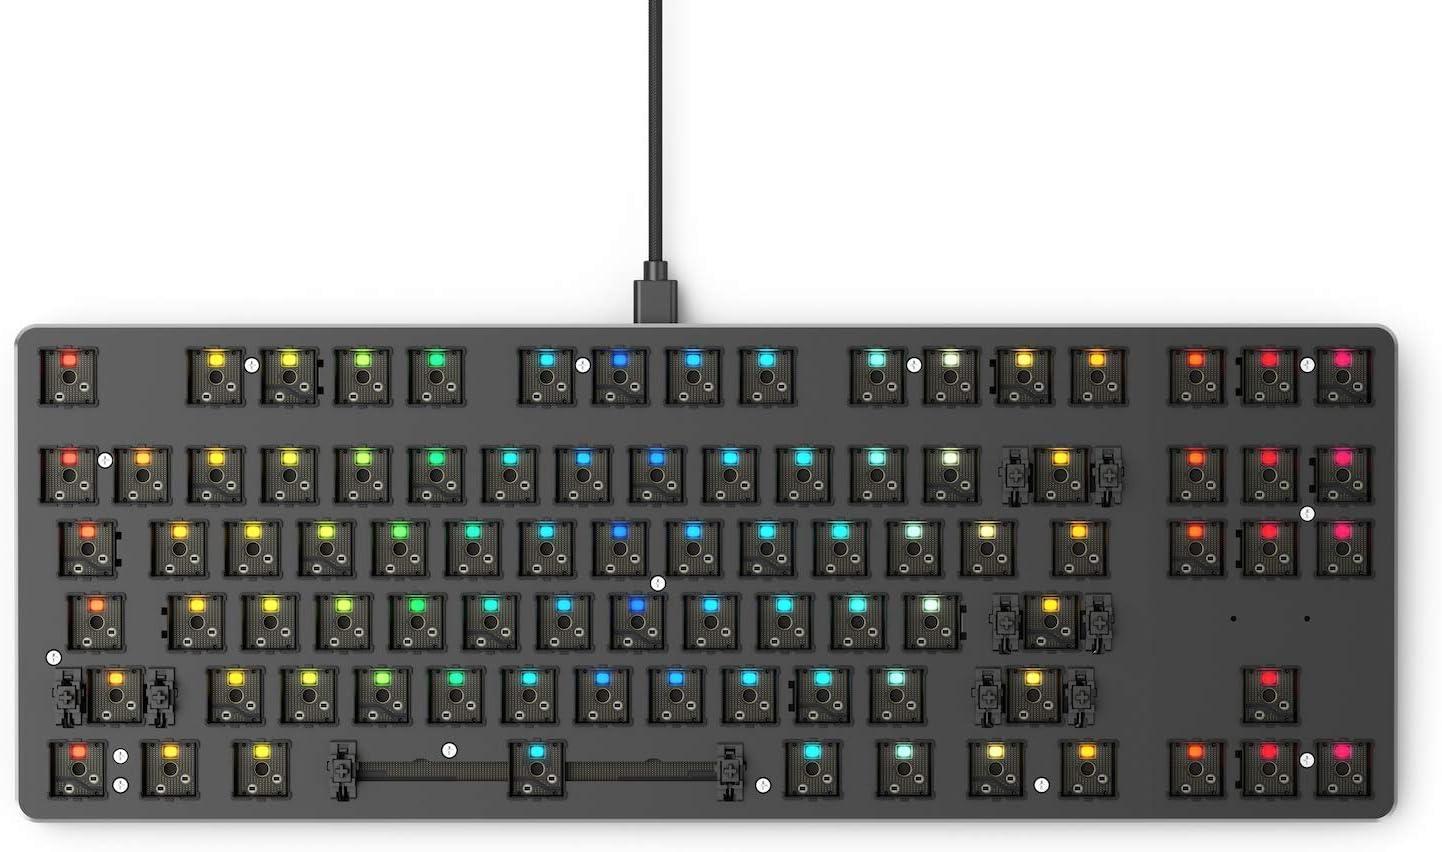 Glorious GMMK Modular Mechanical Gaming Keyboard - Barebone Edition (DIY Assembly Required) - RGB LED Backlit, Hot Swap Switches (Customizable) (Tenkeyless, Black)